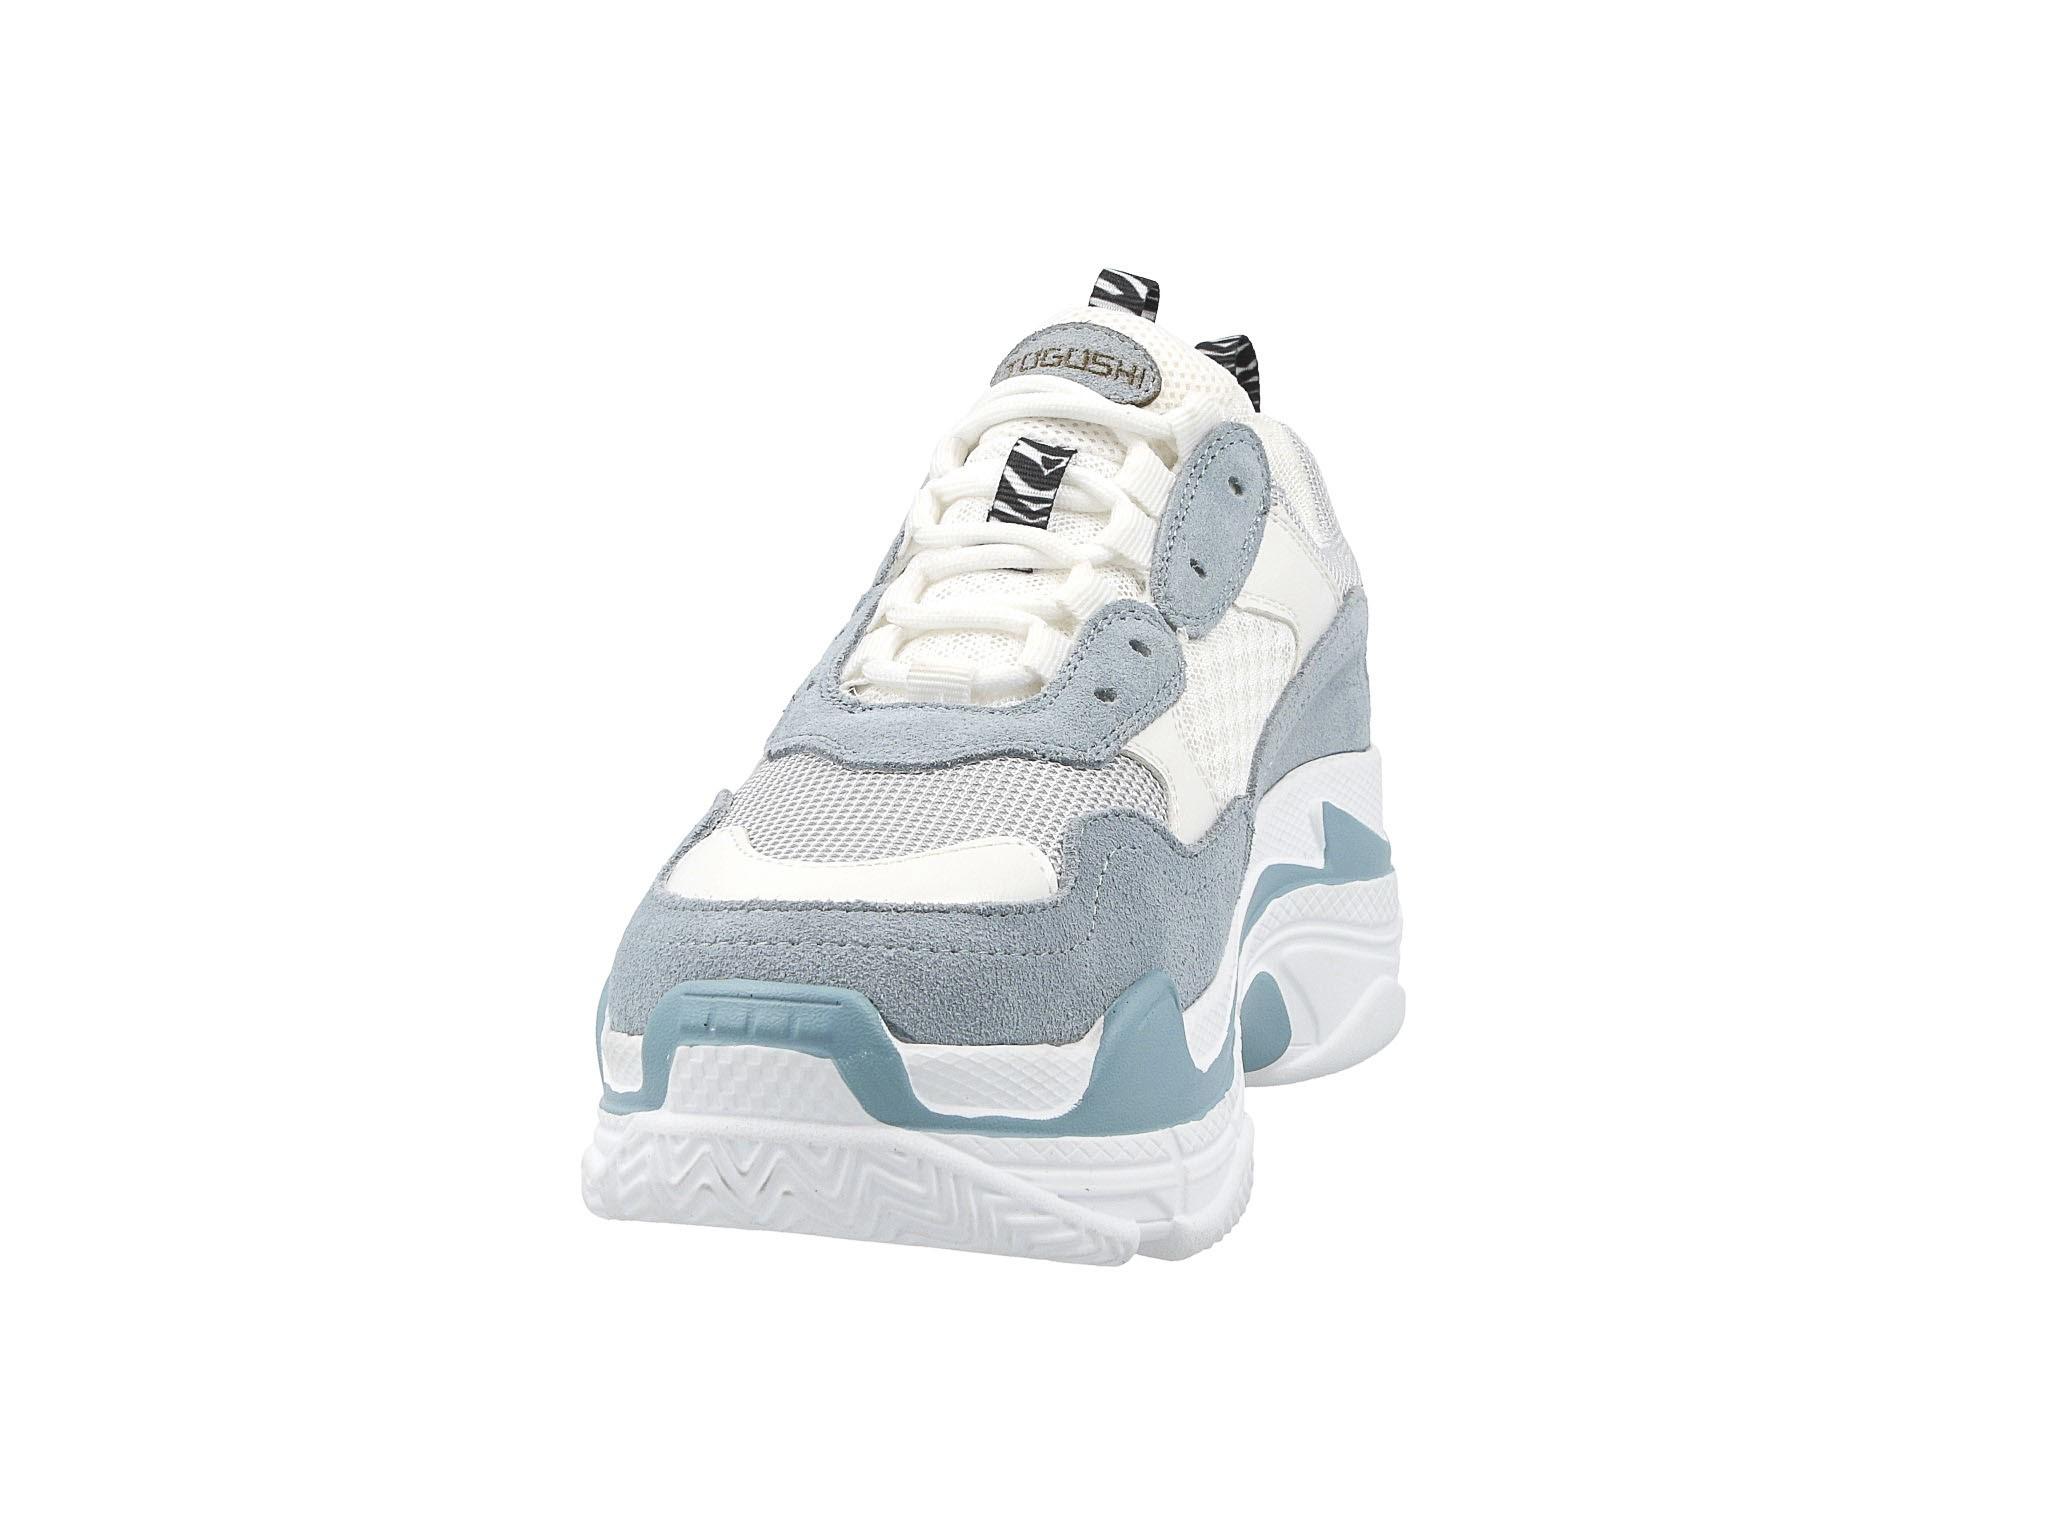 Sneakersy TOGOSHI TG 09 02 000053 641